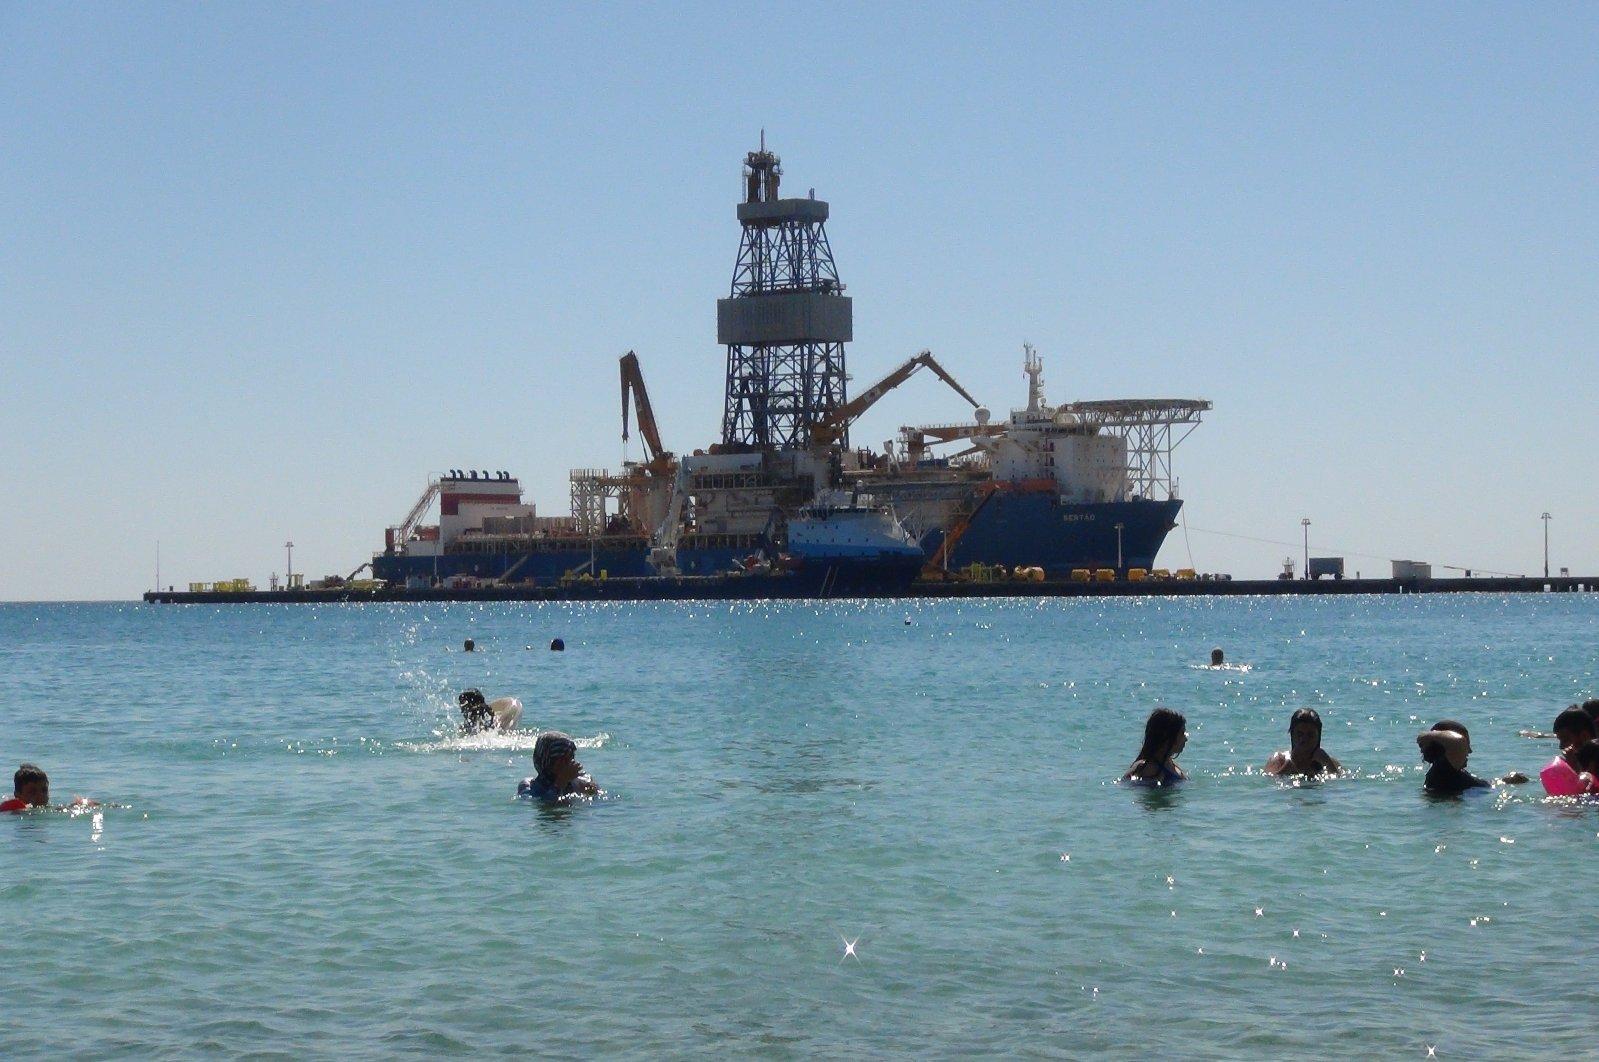 Vacationers swim near Turkey's third drillship Kanuni off Turkey's southern Mersin province, Aug. 17, 2020. (IHA Photo)